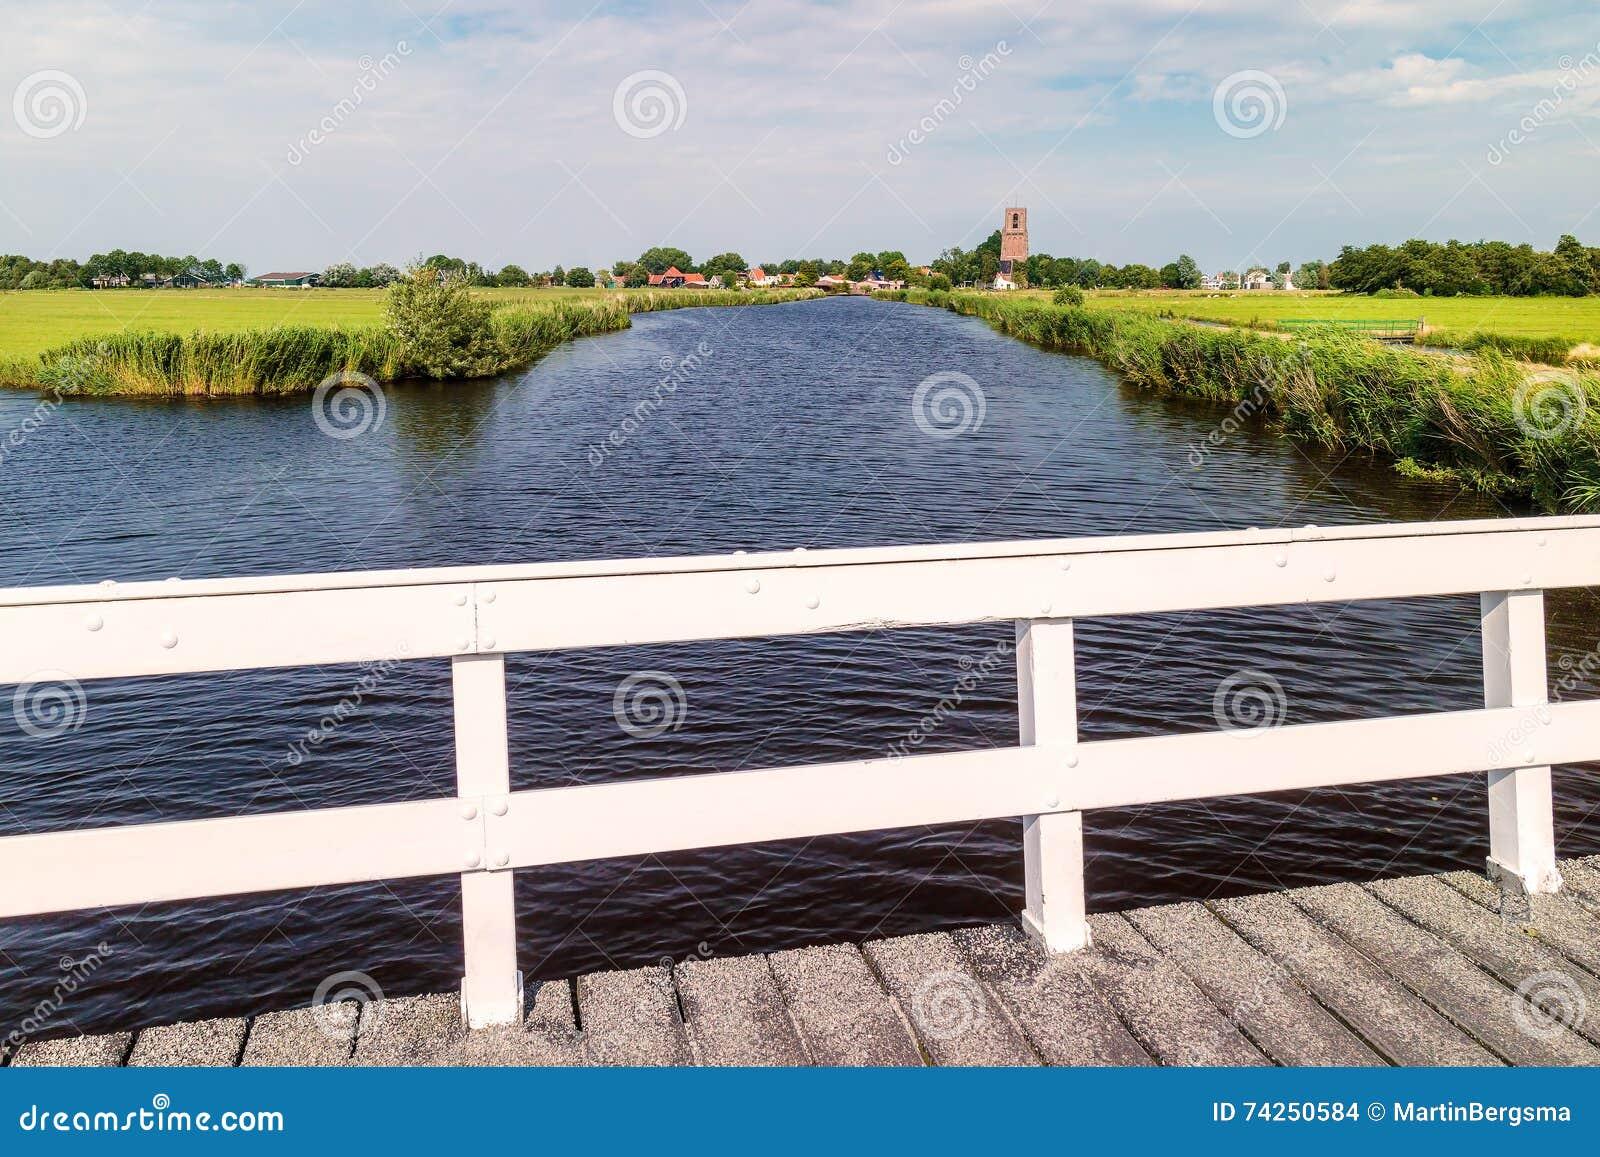 River with bridge north of Amsterdam